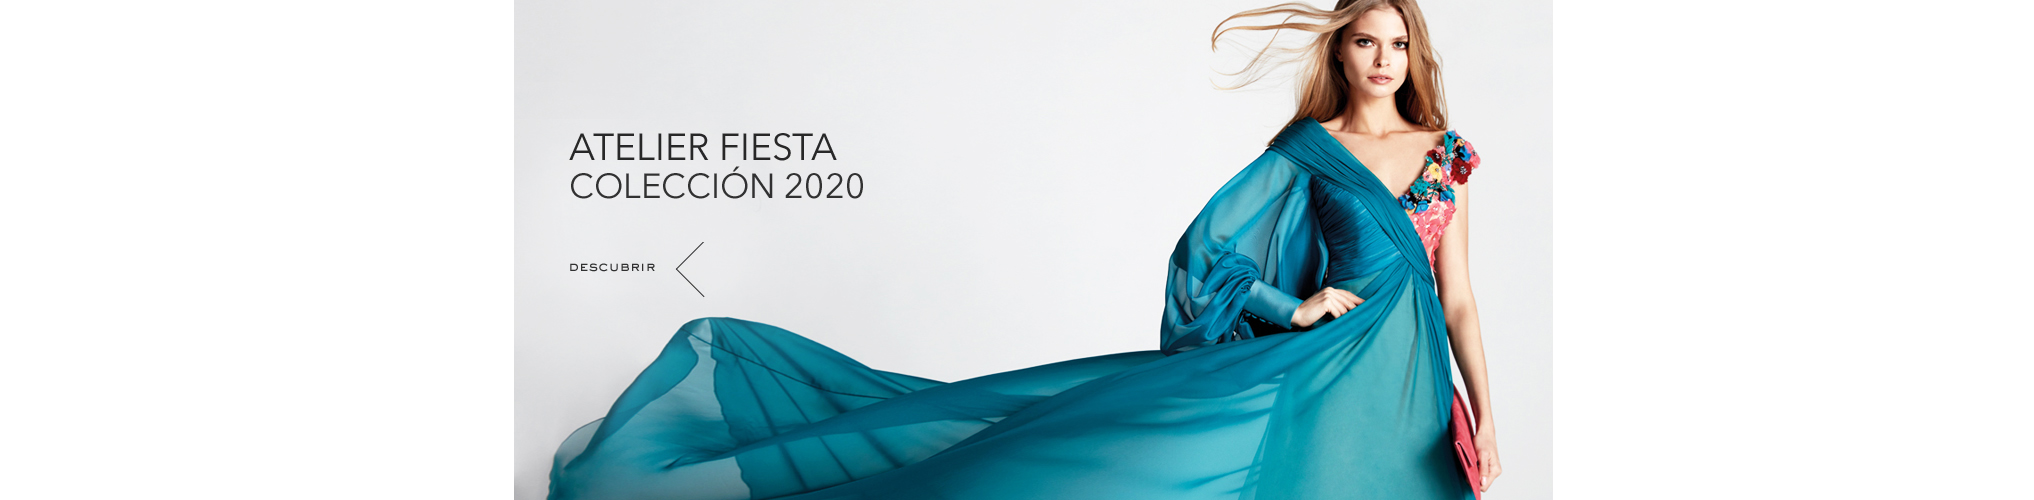 Atelier Fiesta - Colección 2020